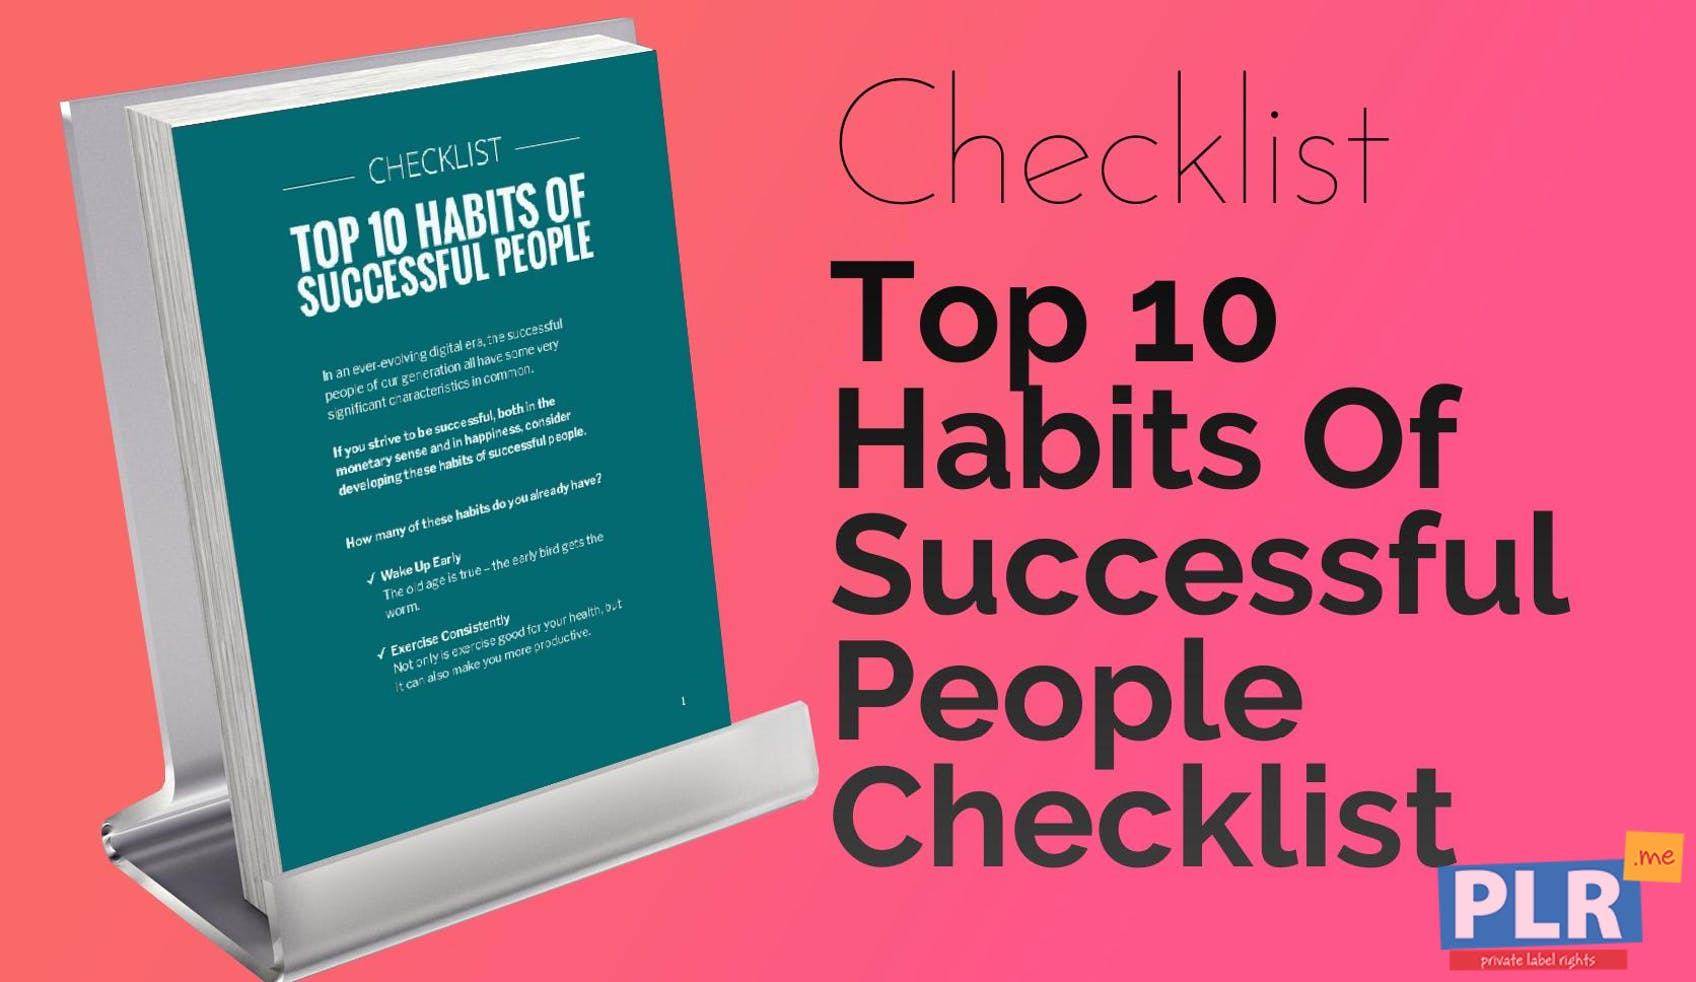 Top 10 Habits Of Successful People Checklist